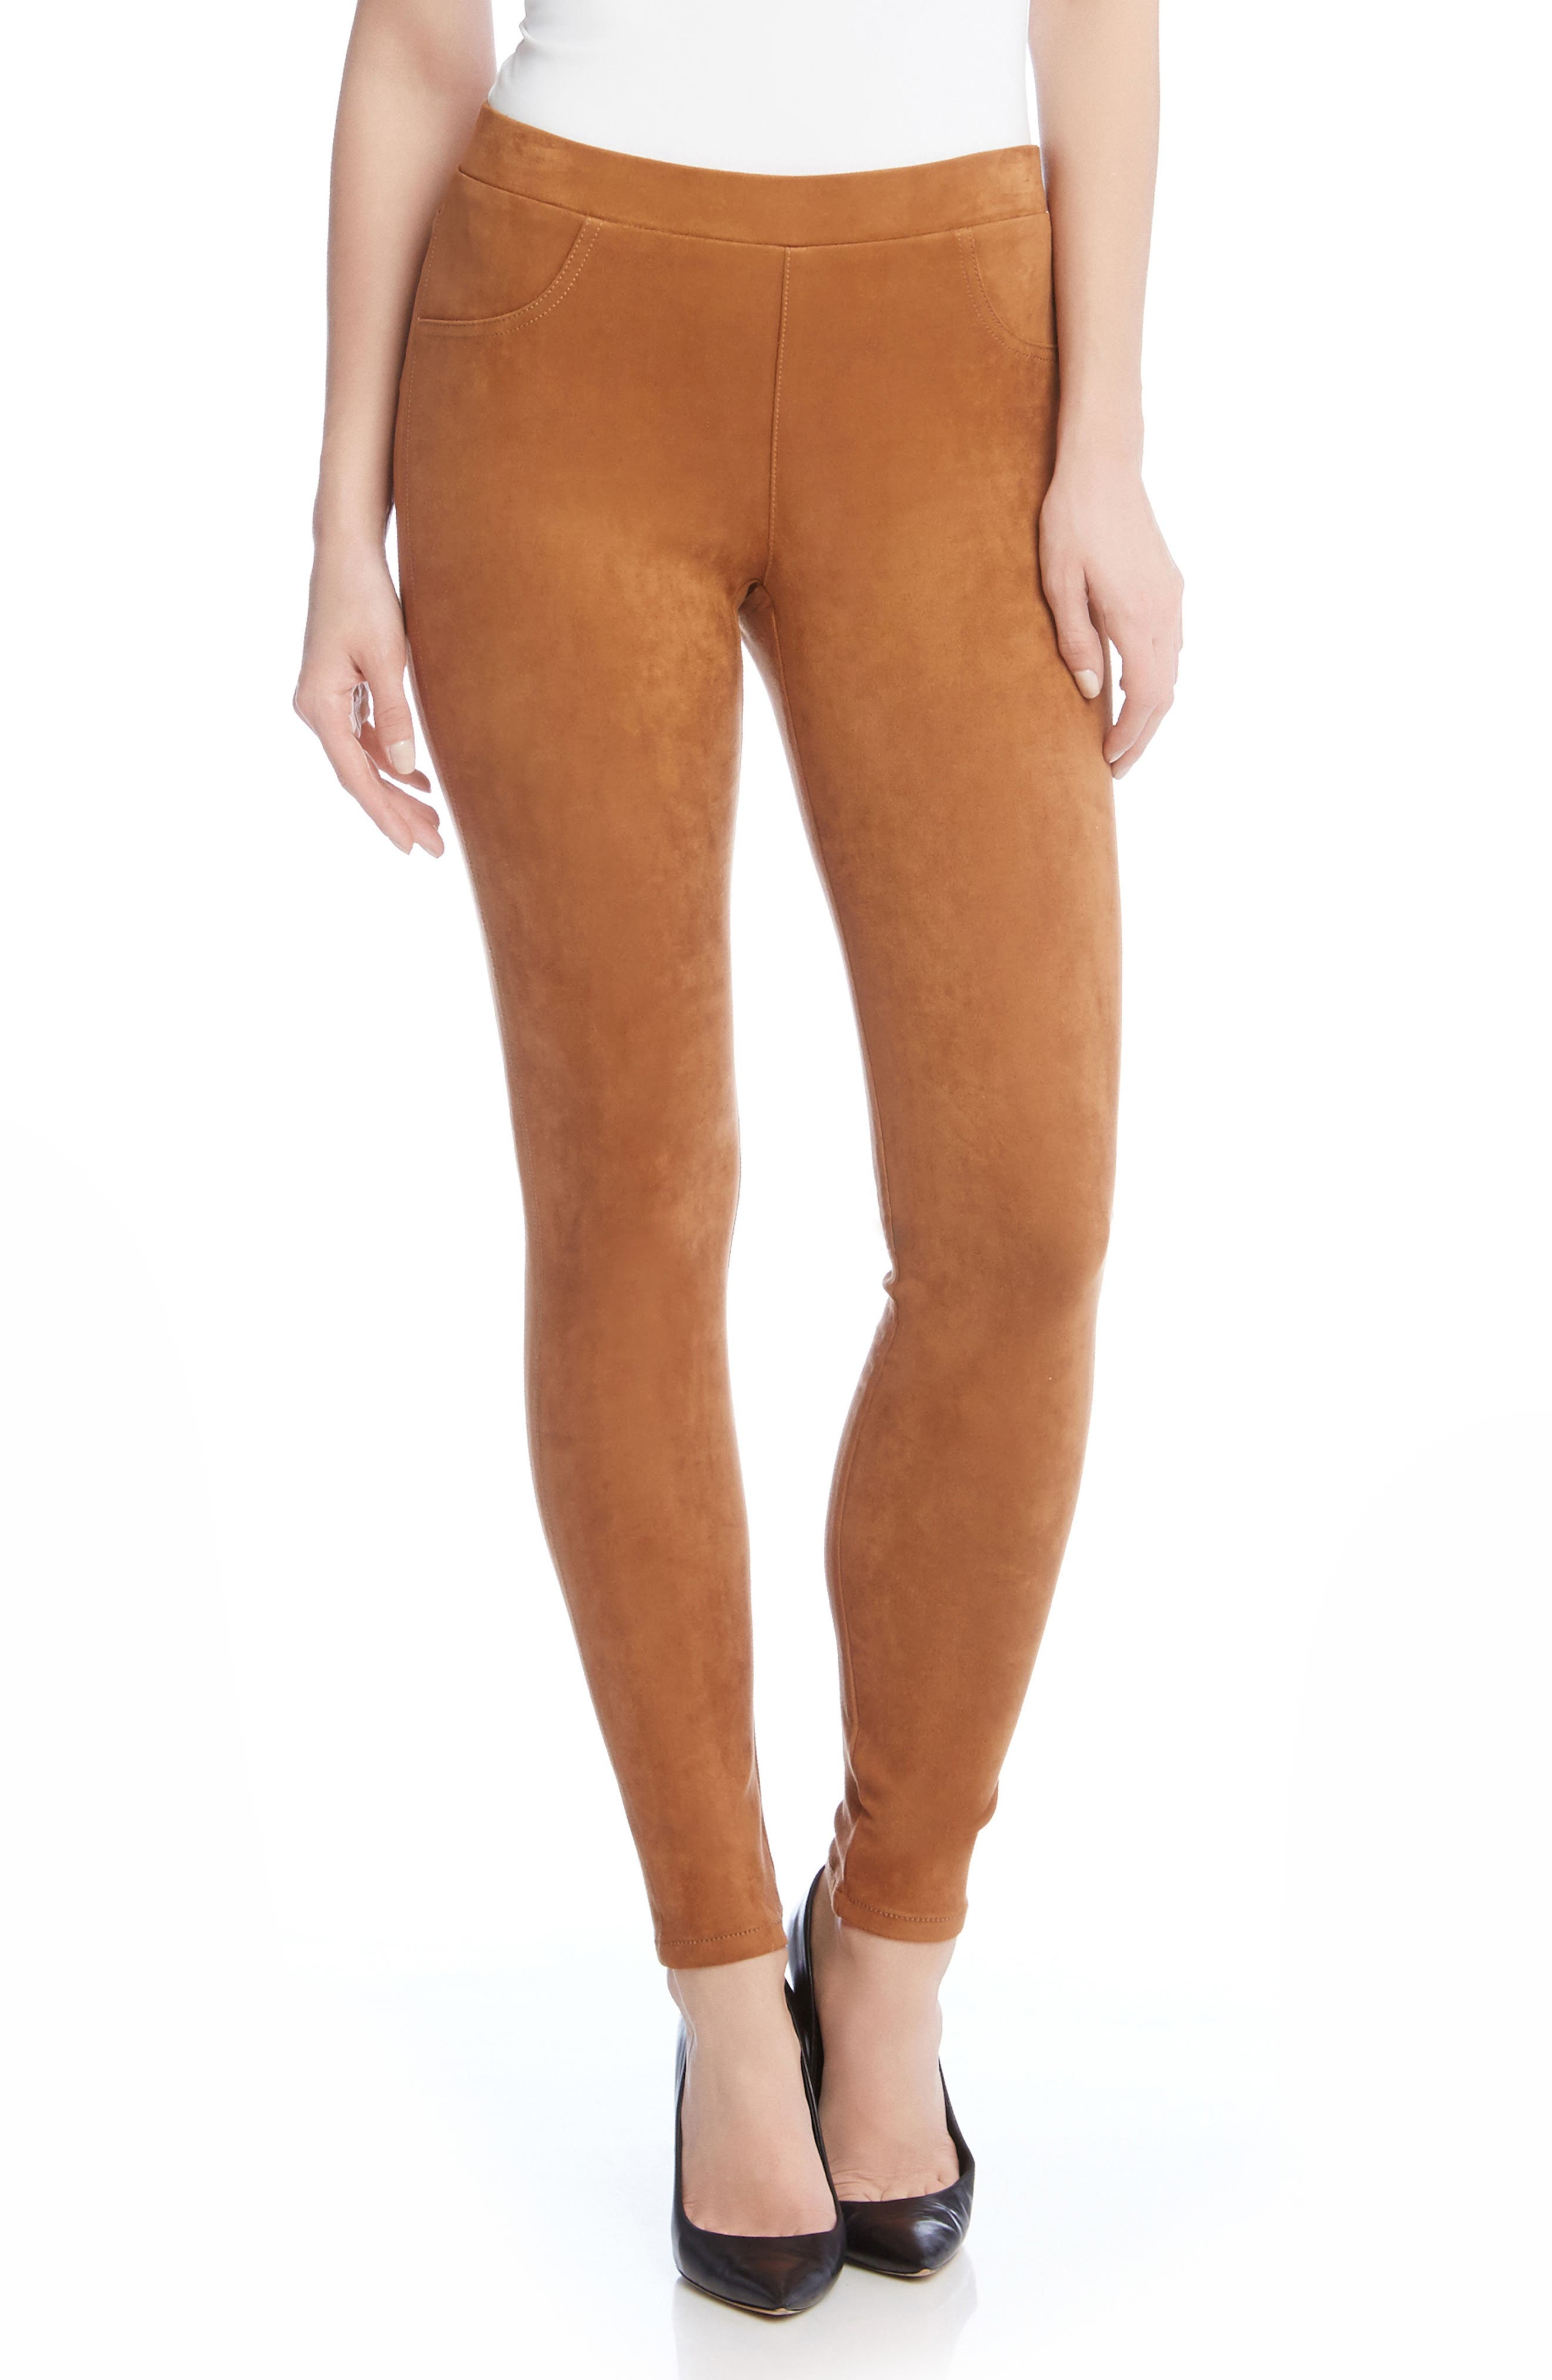 Alternate Image 1 Selected - Karen Kane Faux Suede Knit Skinny Pants